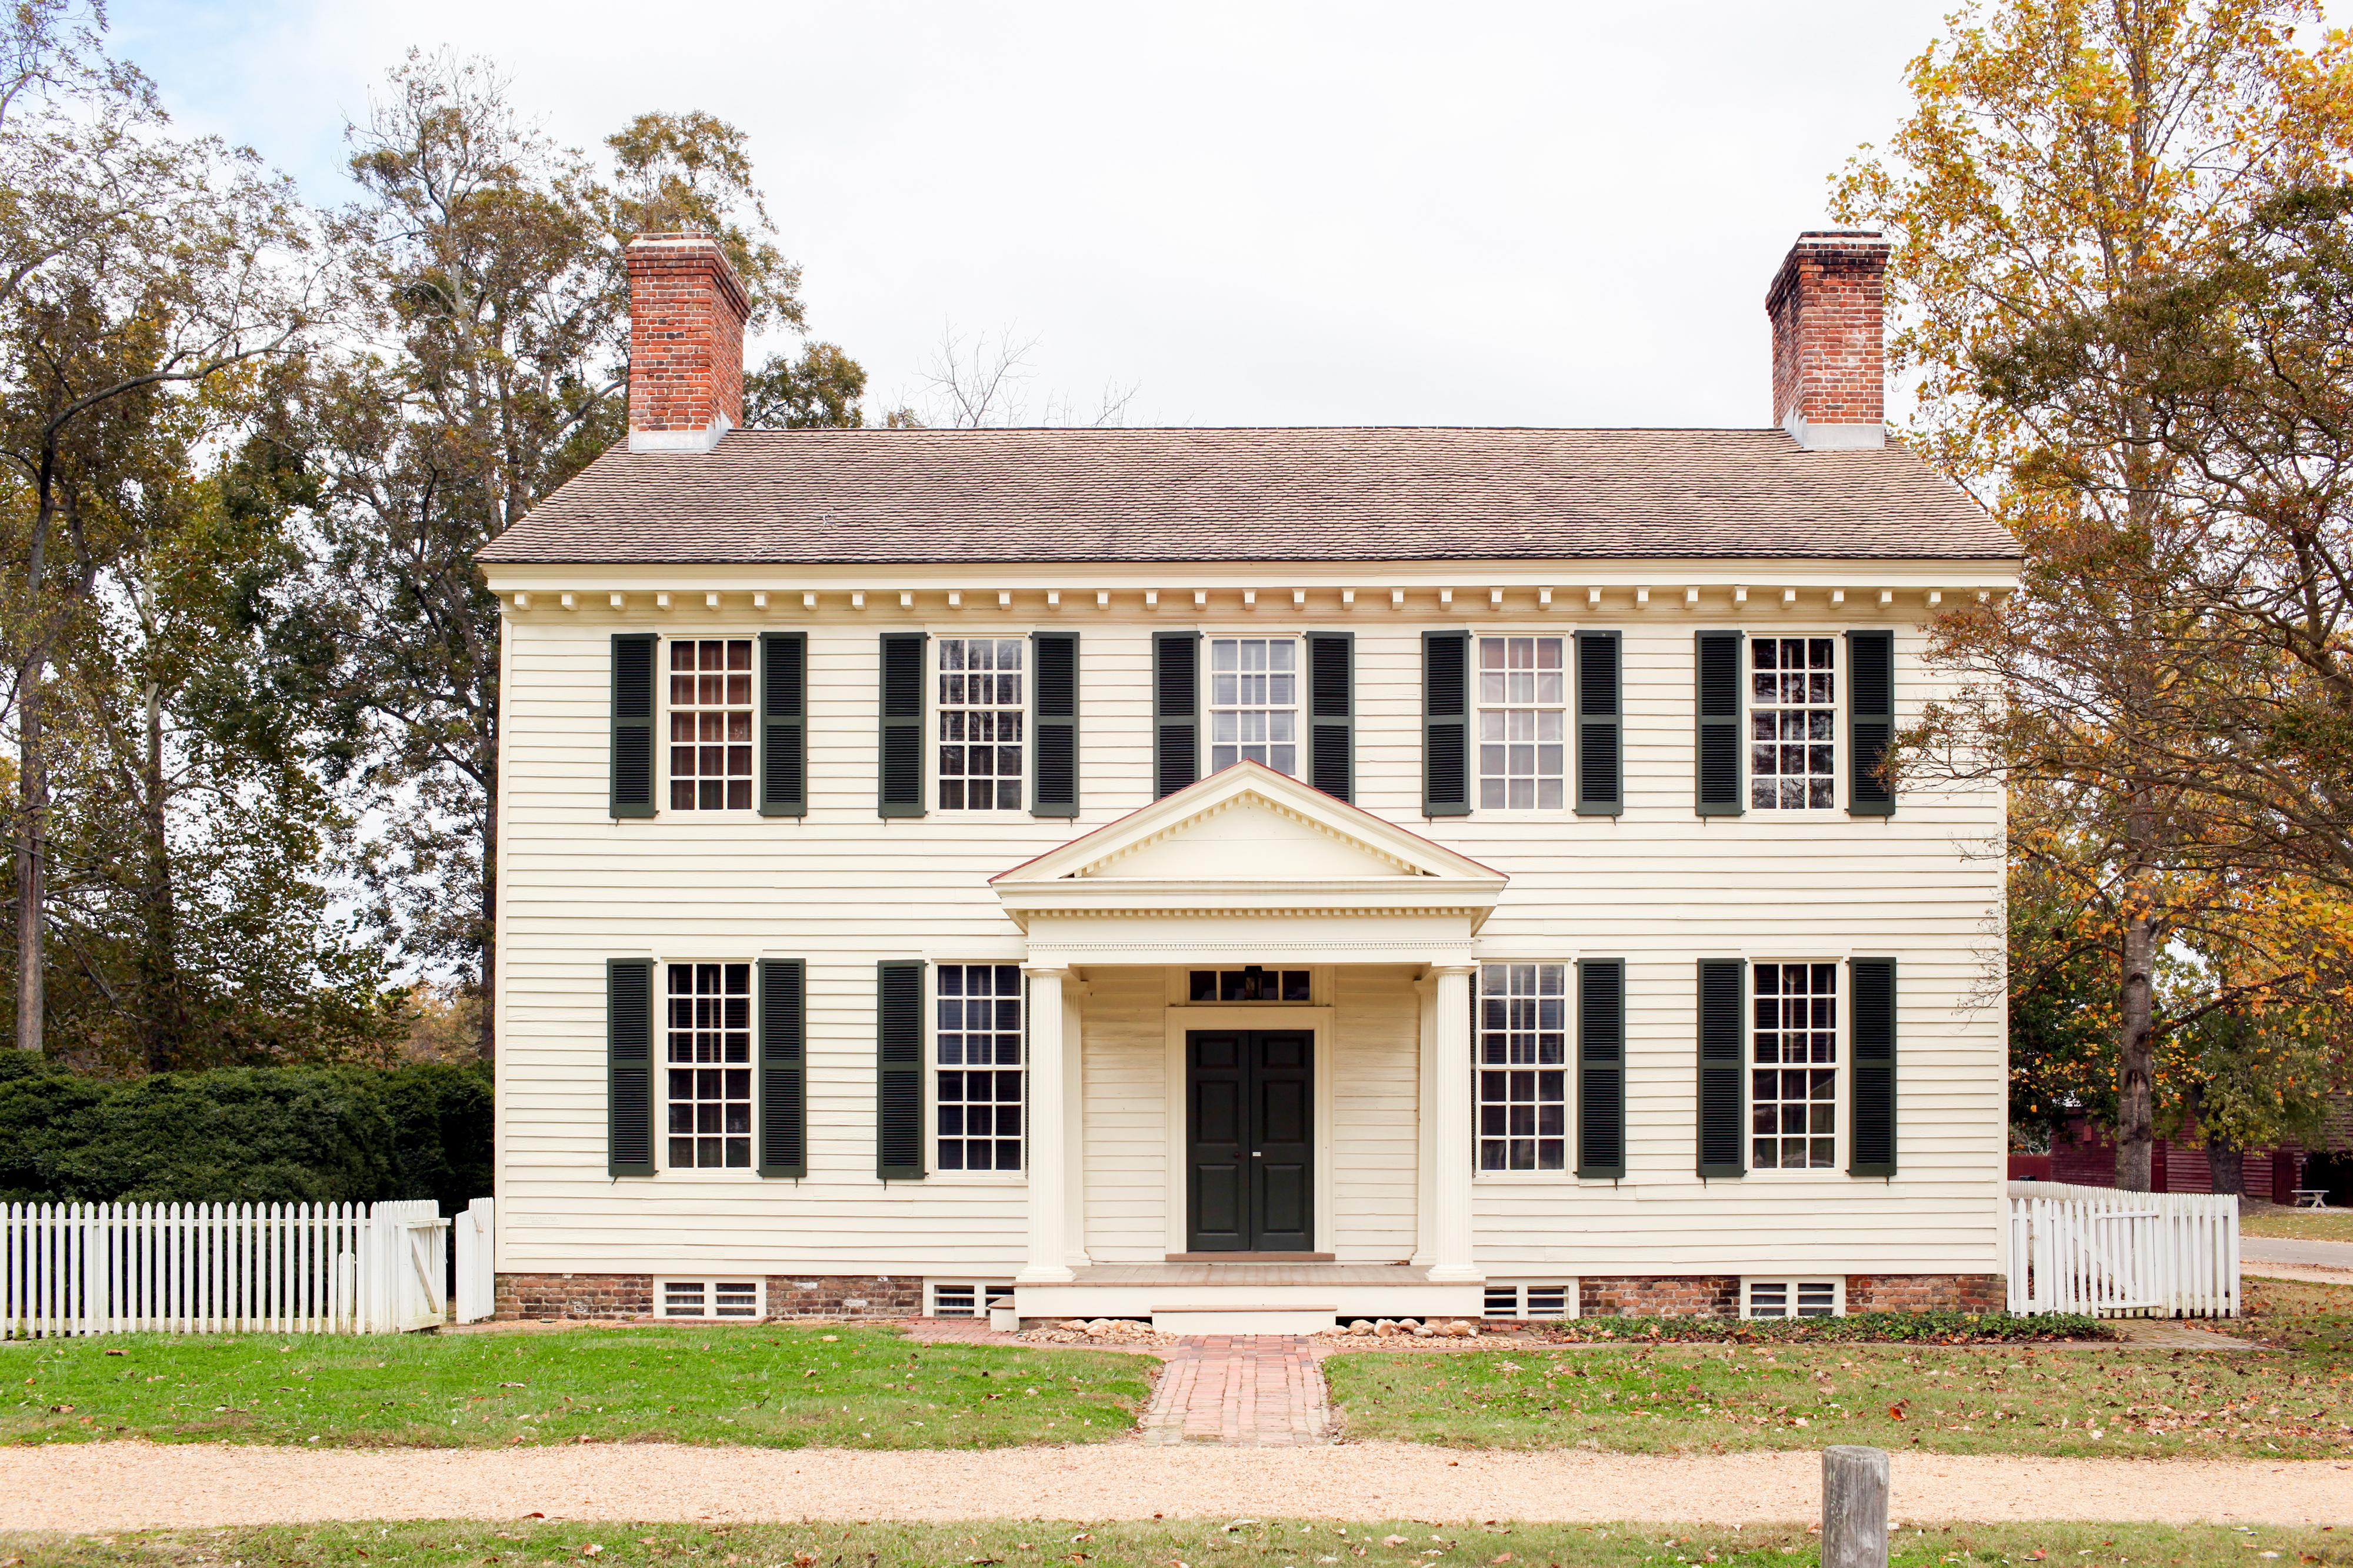 Home Exterior,Maryland